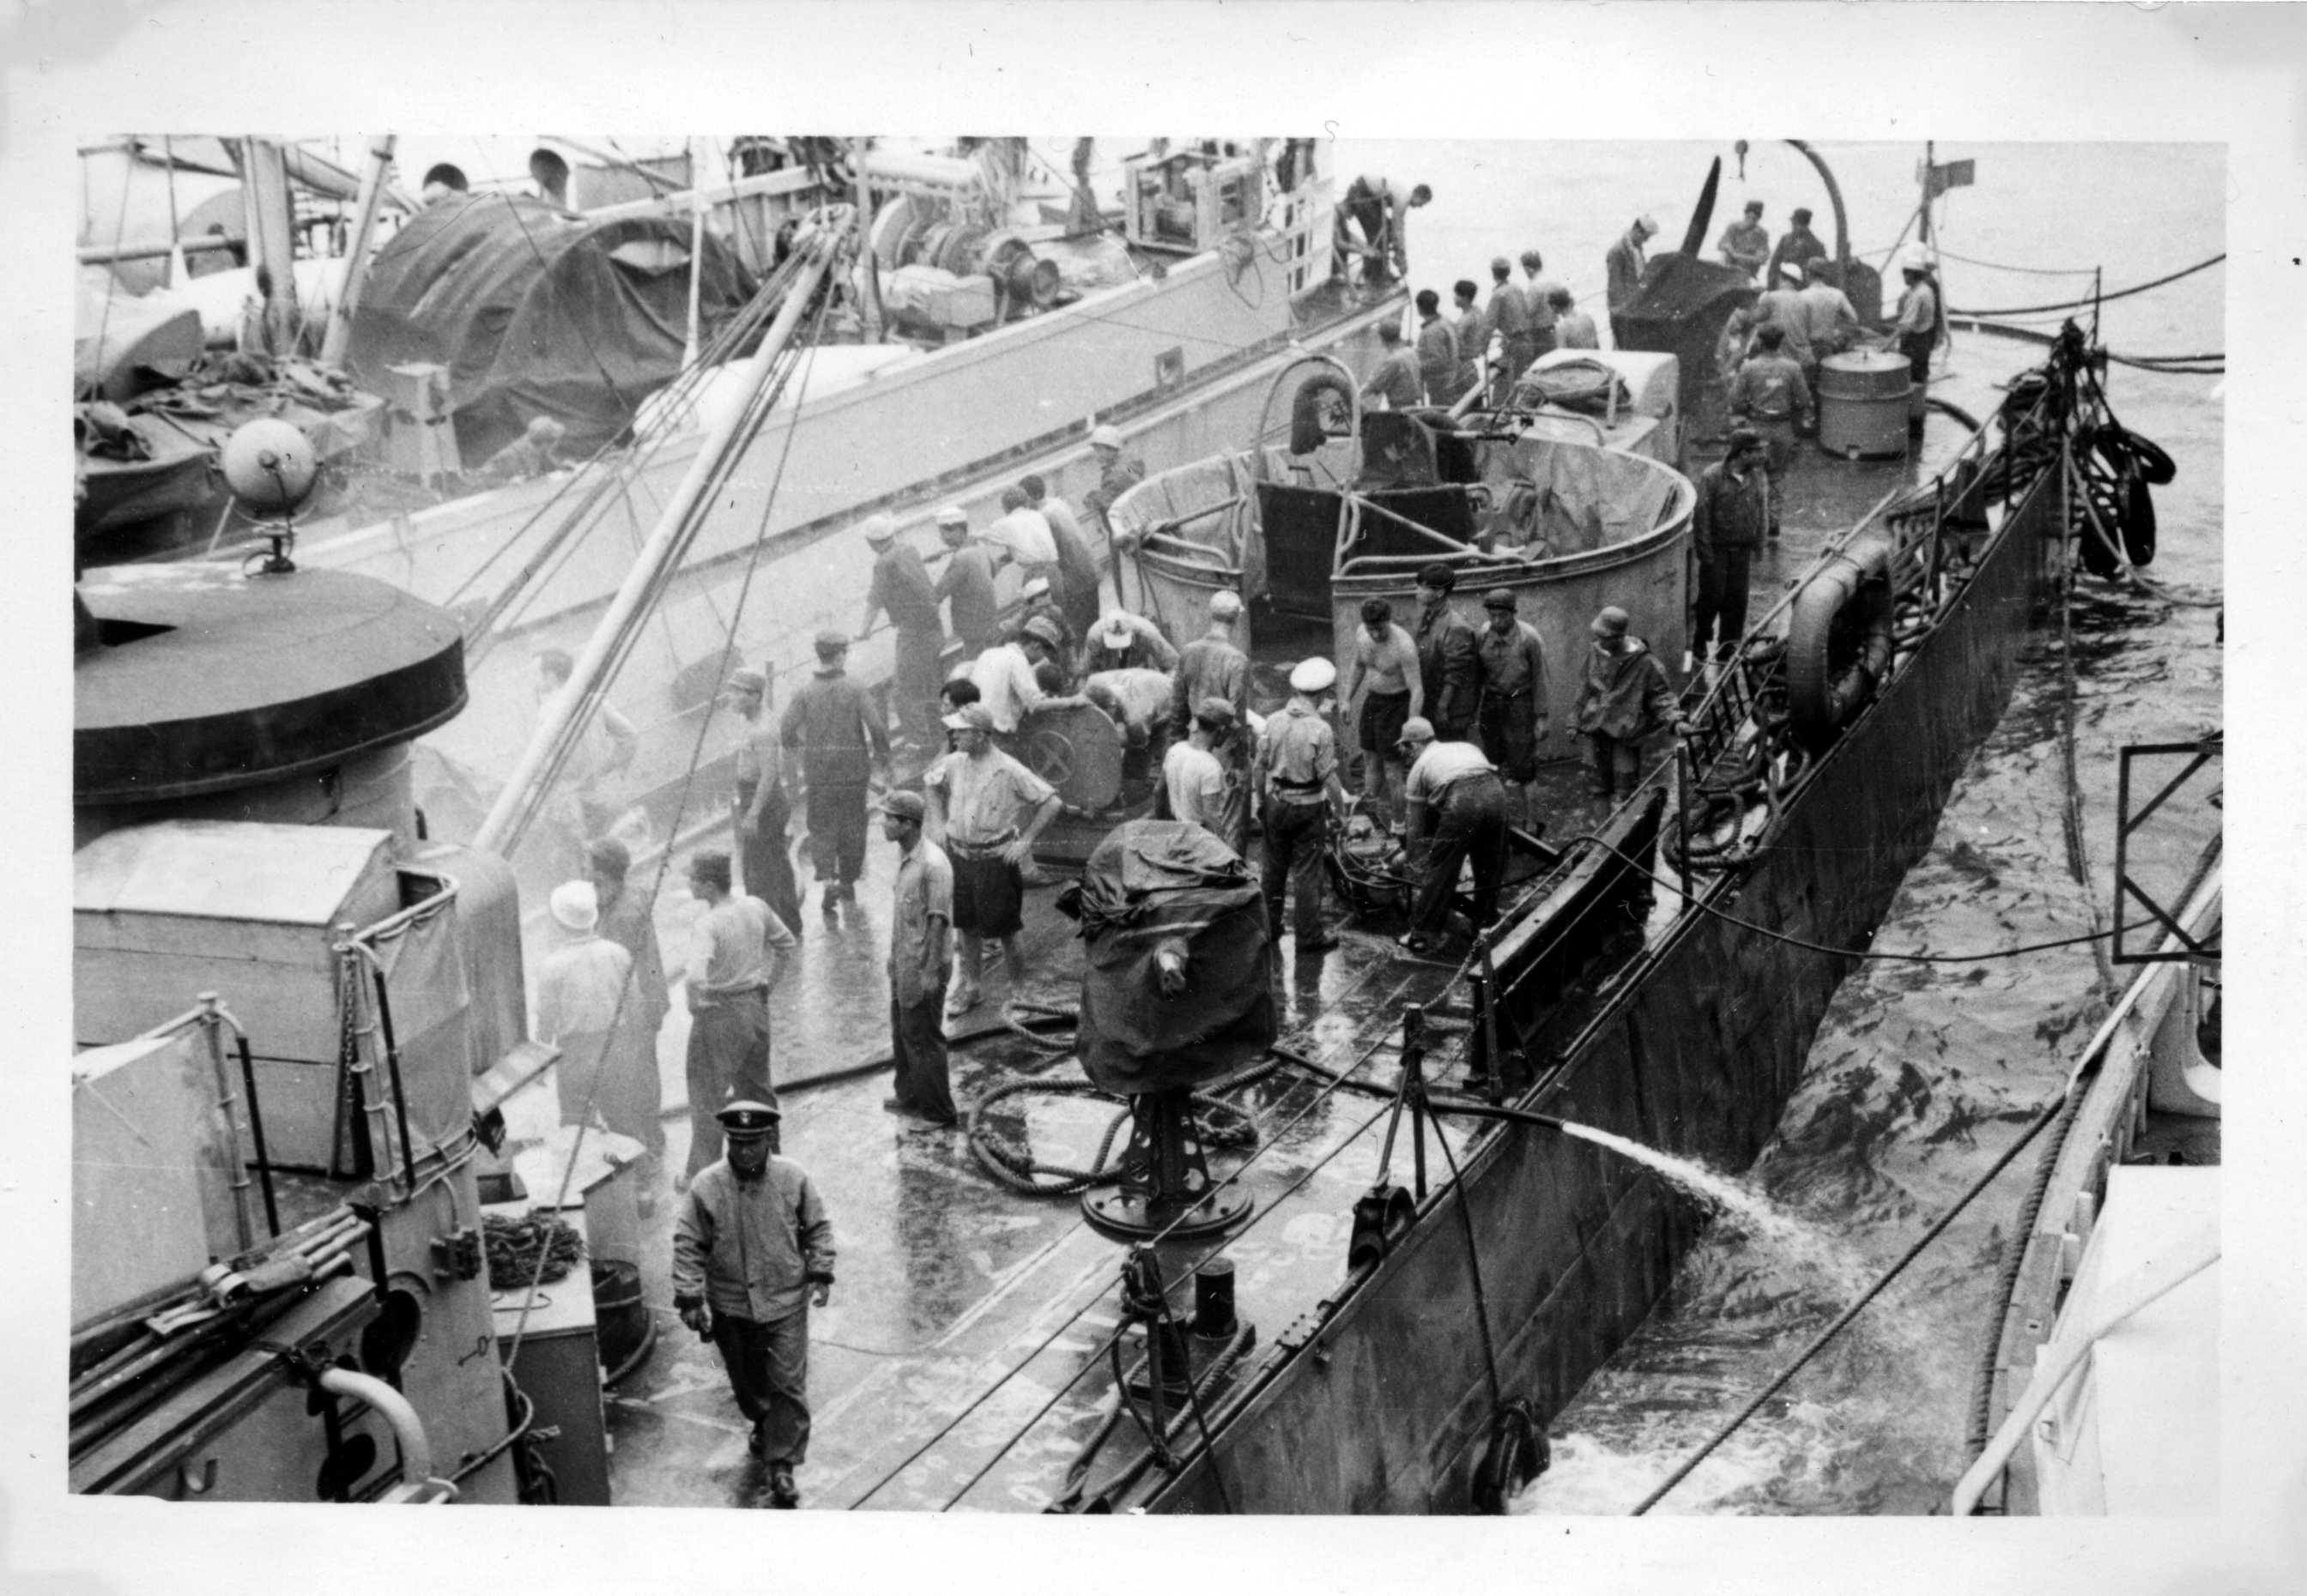 S. Korean navy, Korean War, Don Jatiouk.